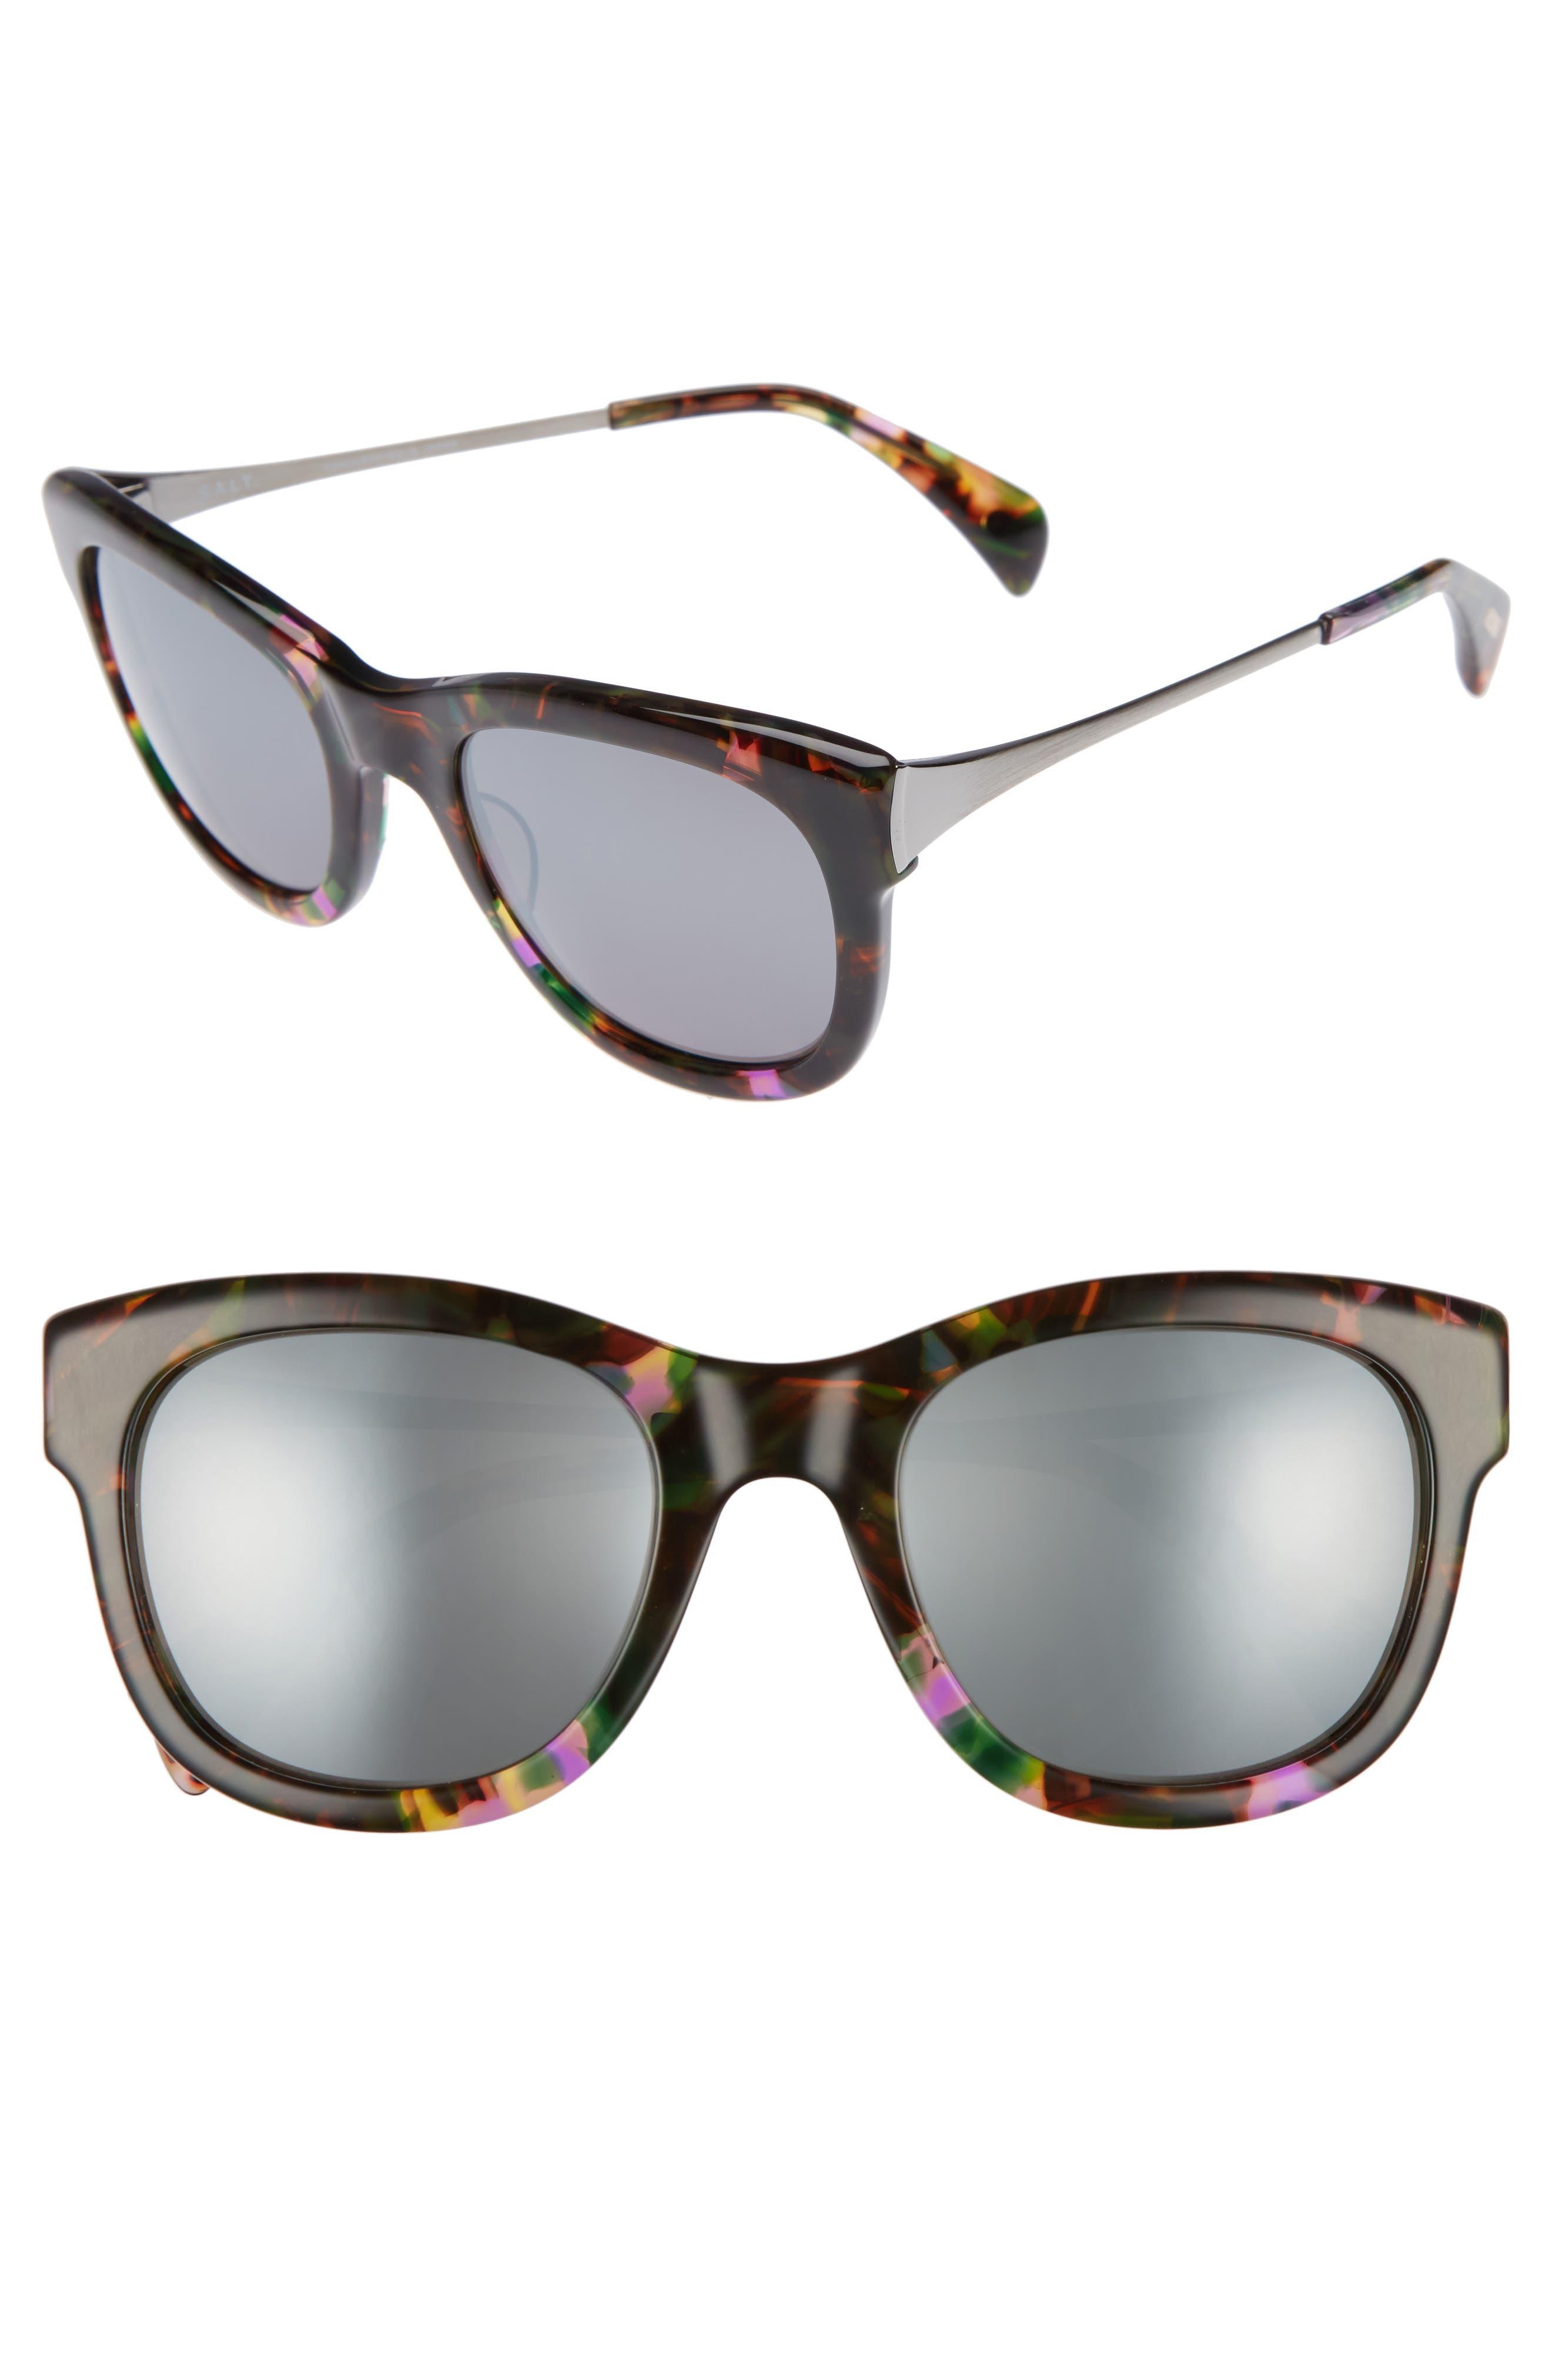 Main Image - Salt 53mm Polarized Square Sunglasses